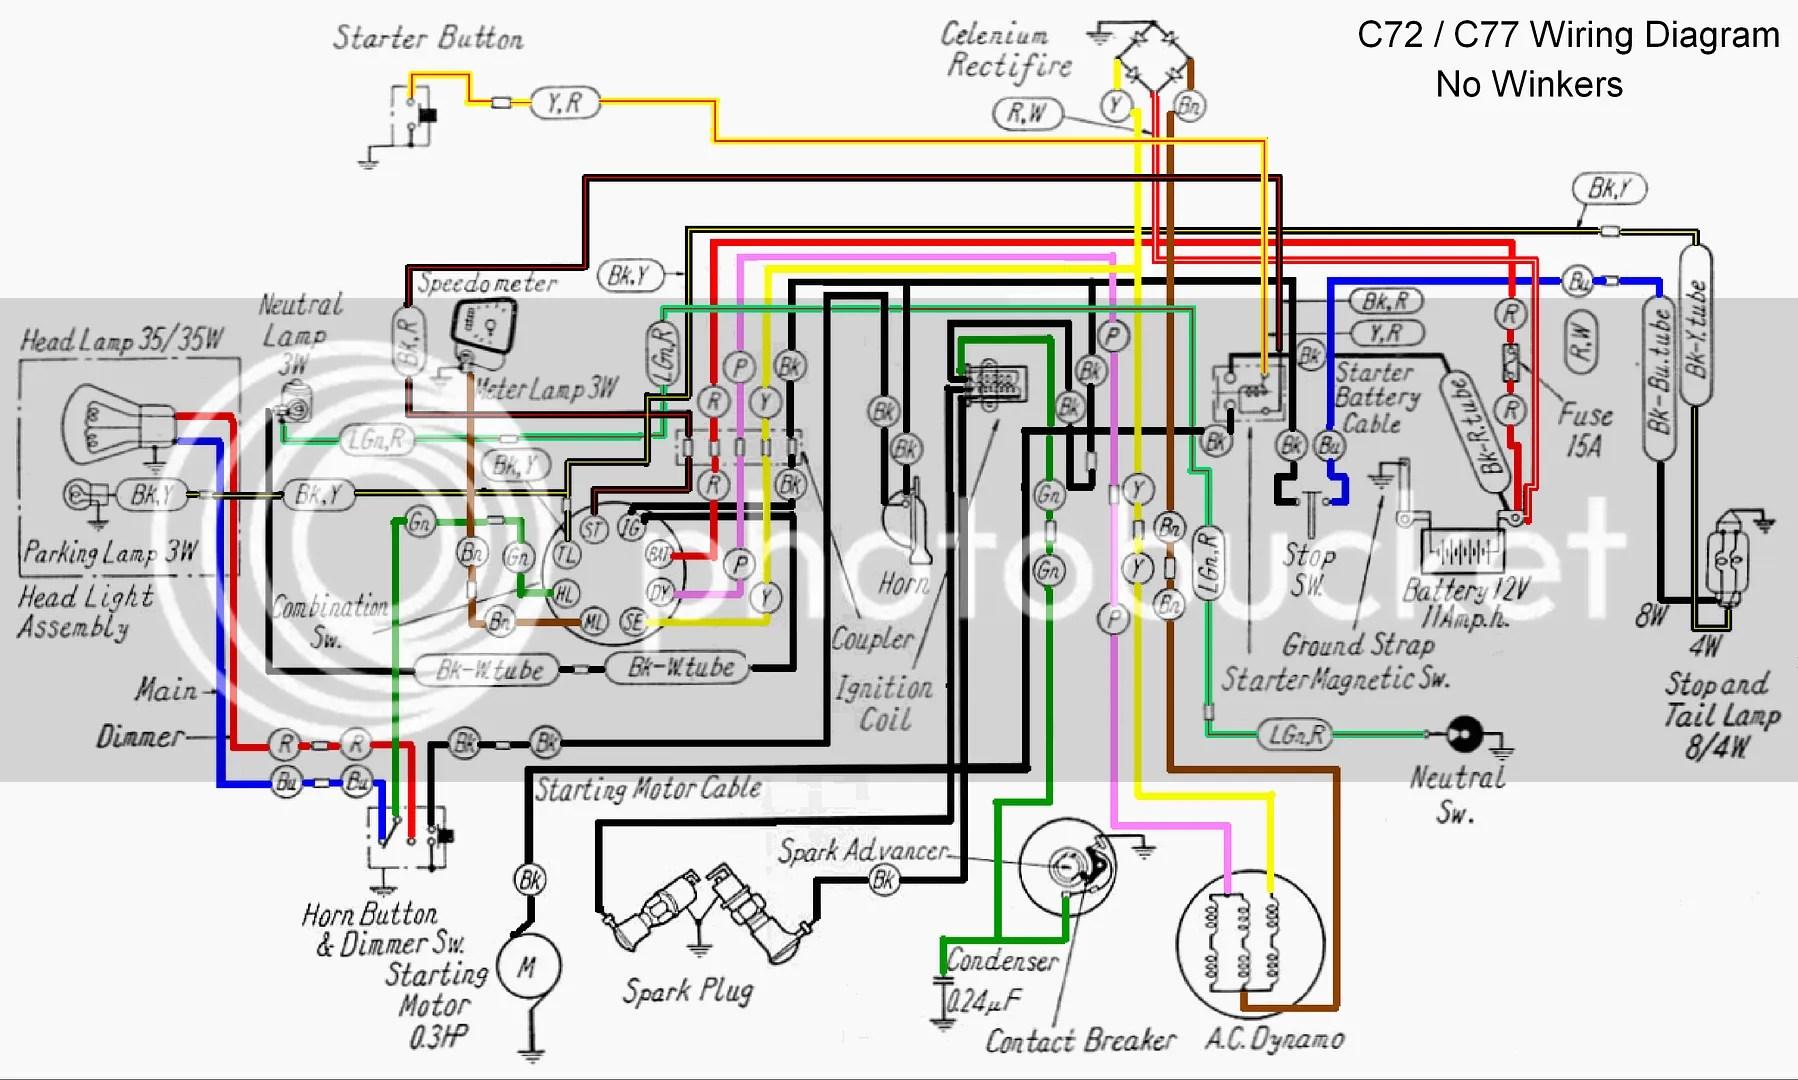 Wiring Diagram Honda Cl70